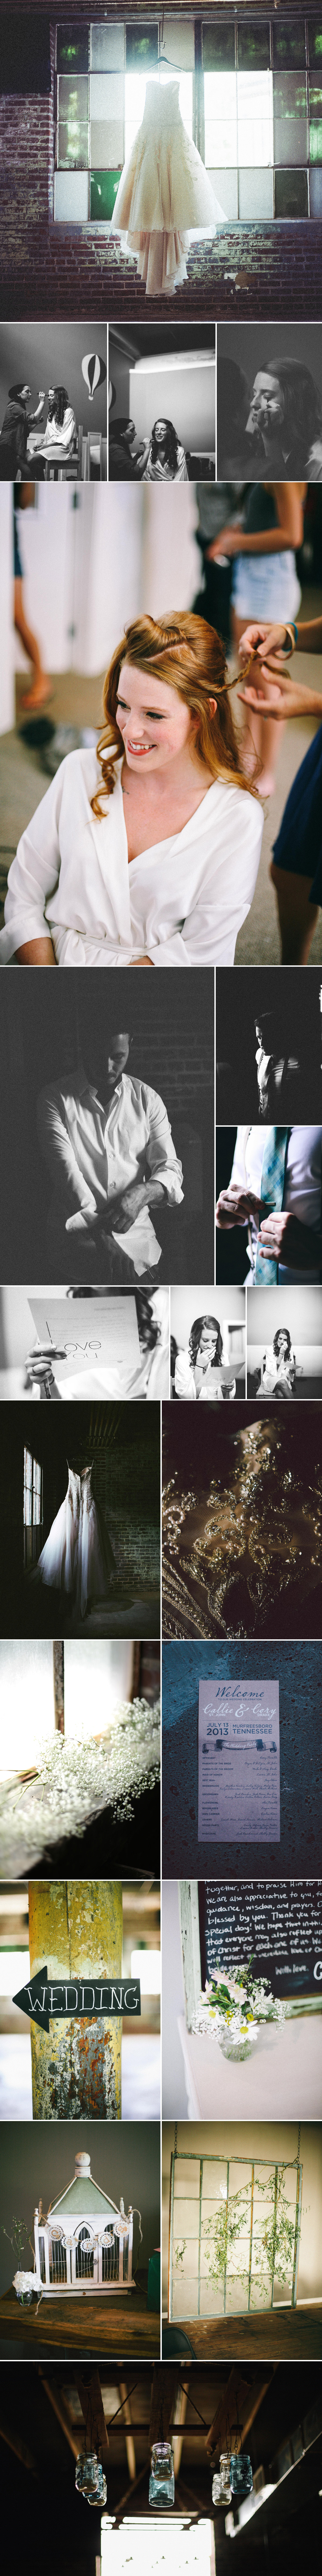 Blog-Collage-1377994130748.jpg